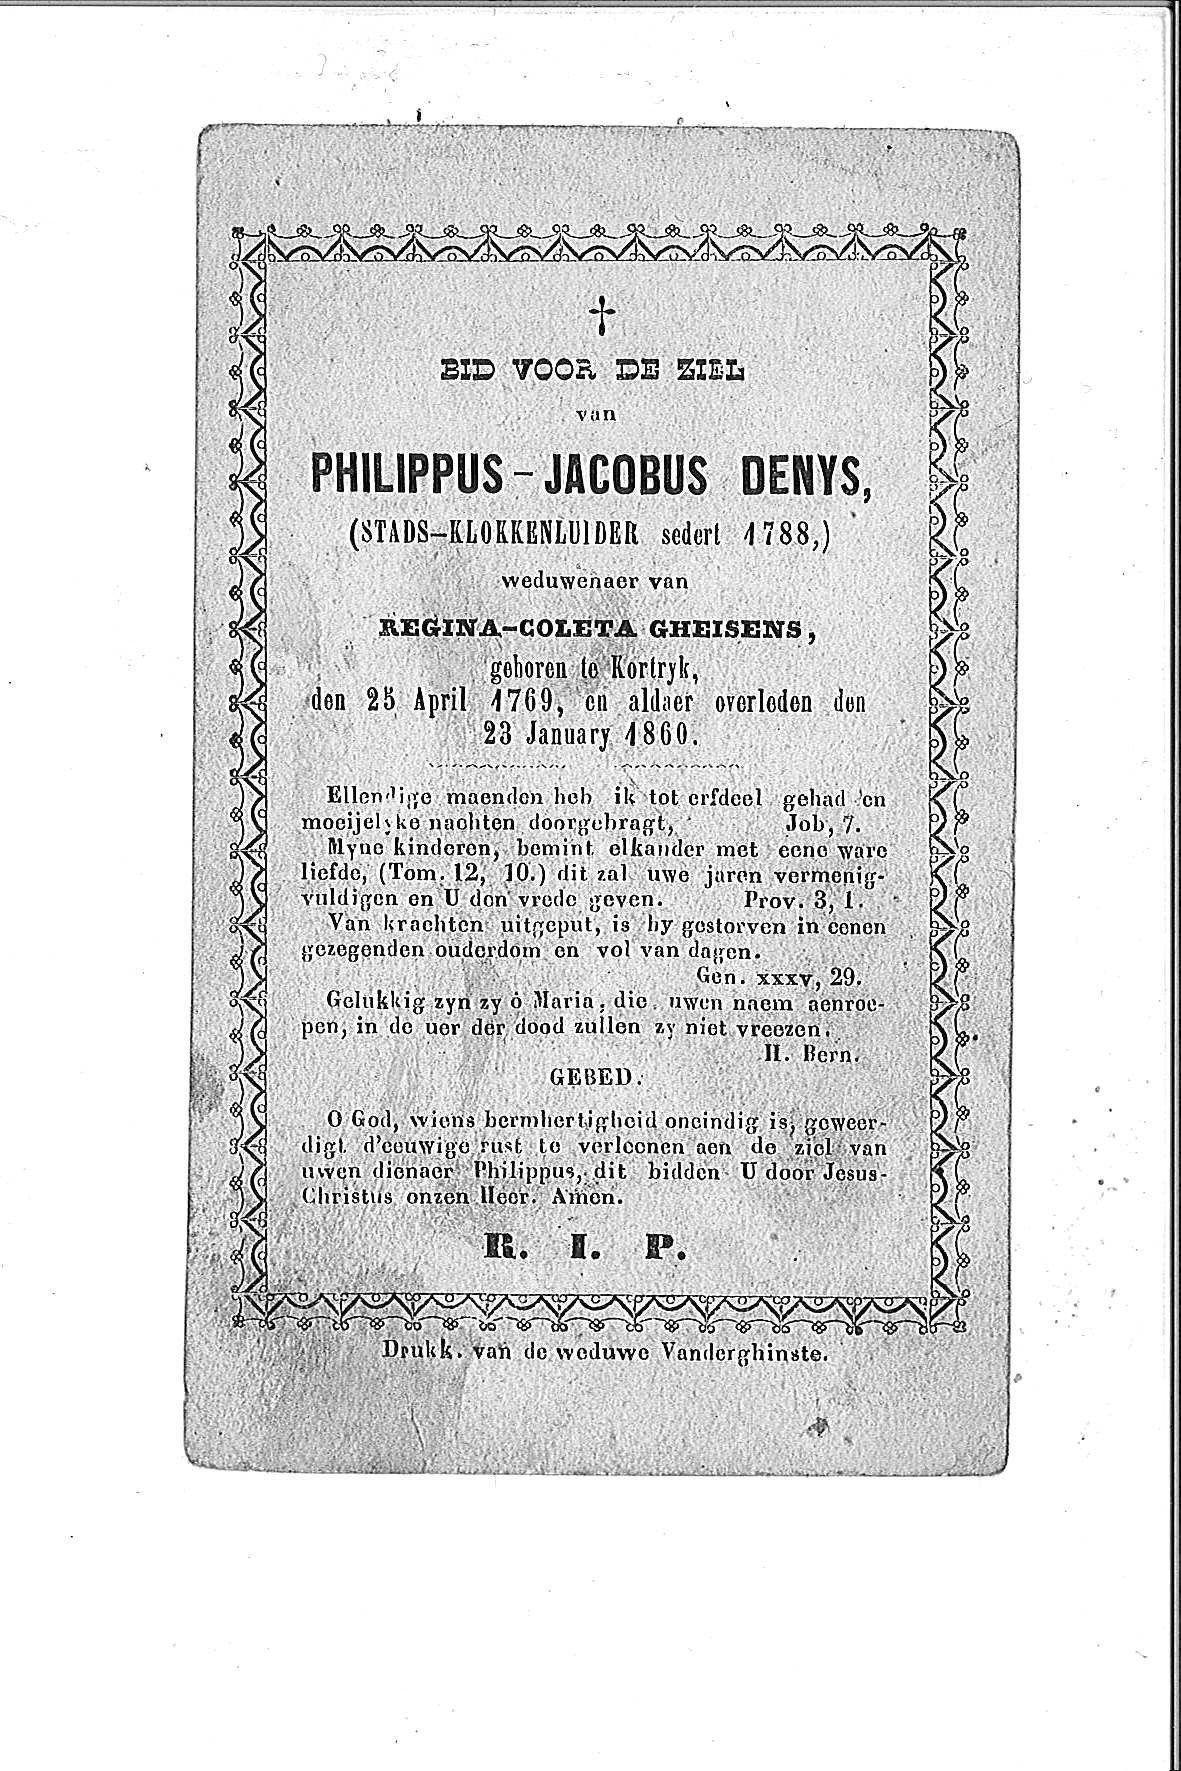 Philippus-Jacobus(1860)20150415130638_00019.jpg